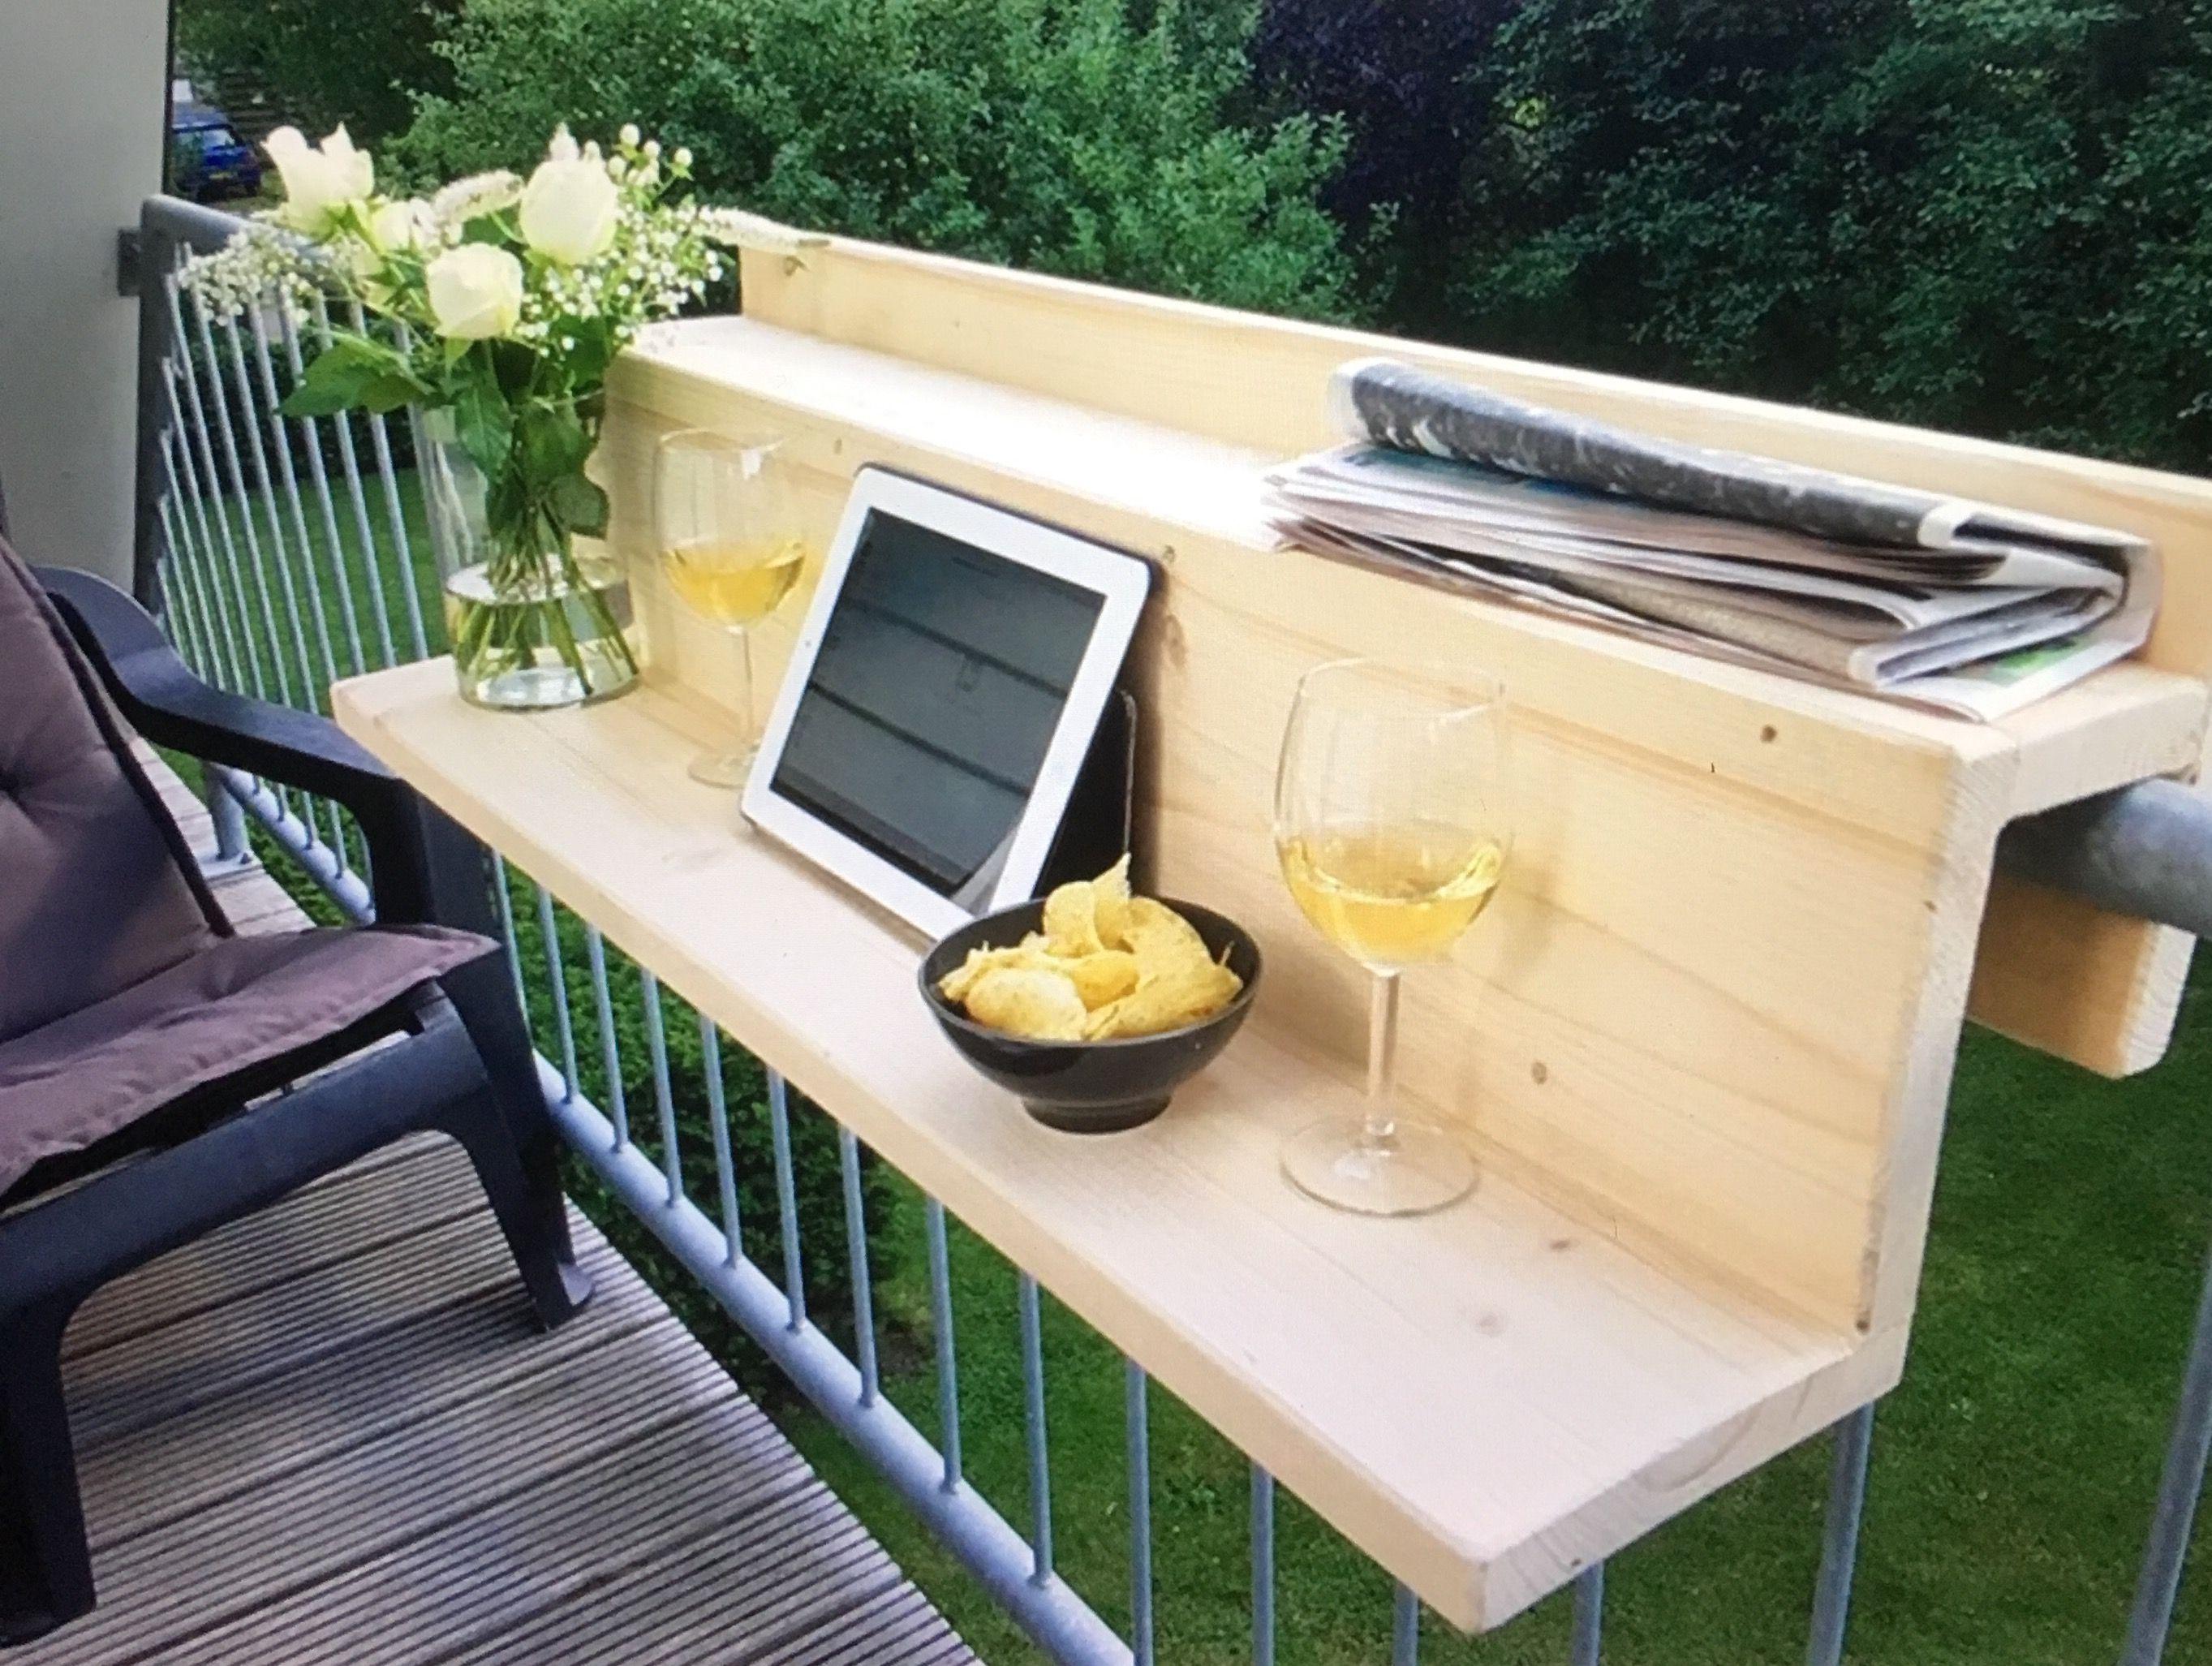 Houten Balkon Meubels : Houten balkontafel houten pallets 가구 아이디어 en 가구